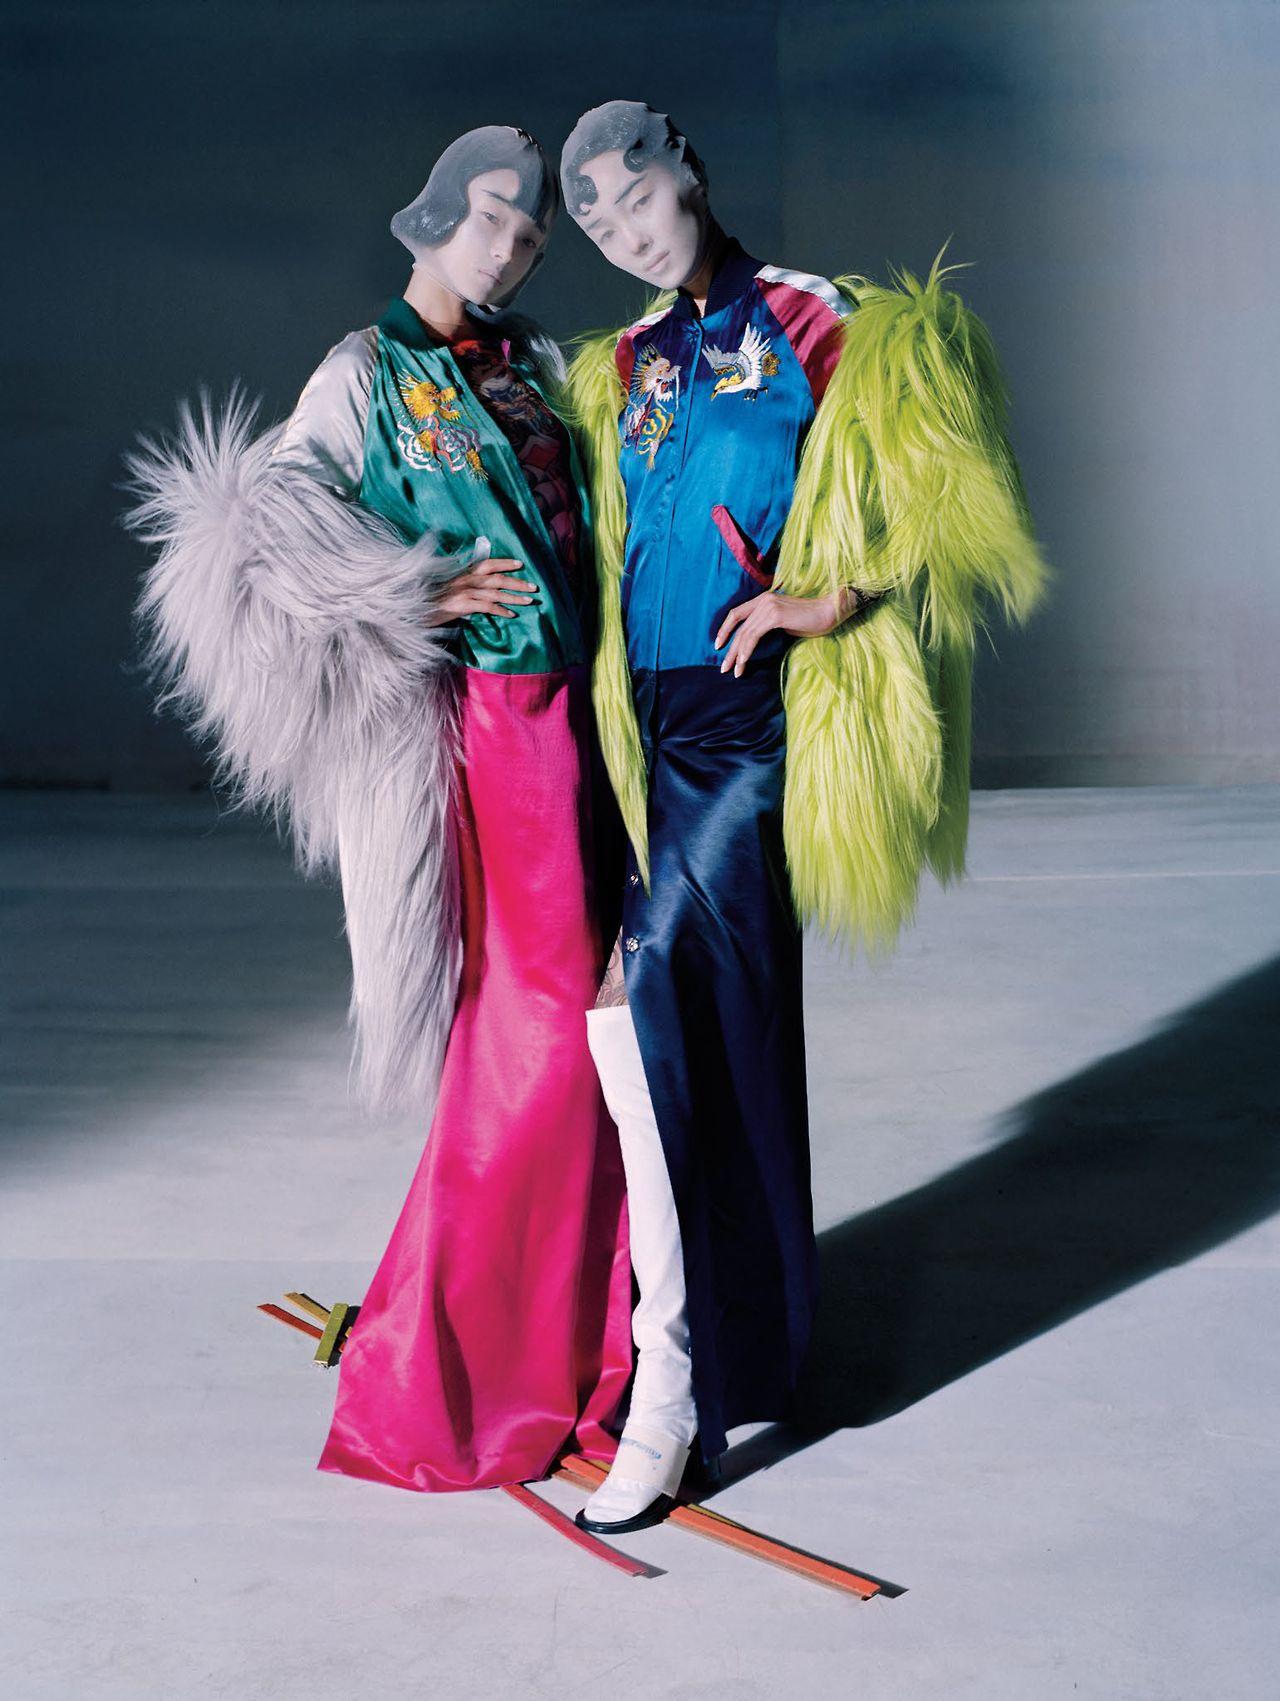 Xiao Wen Ju and Fei Fei Sun by Tim Walker for Vogue China, December 2014